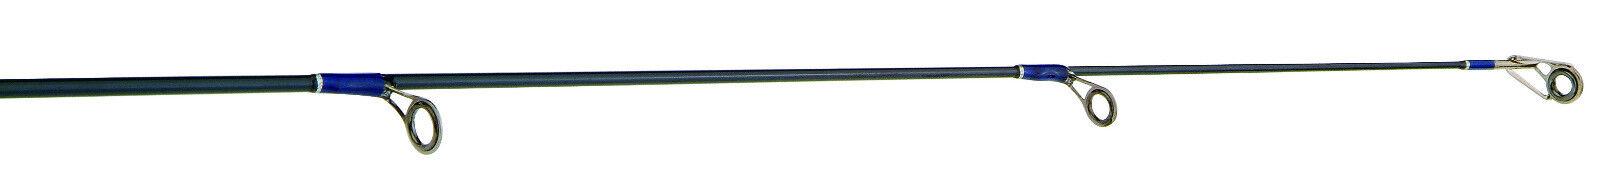 PALASTAR Profi DROP SHOT SHAD Angel-Rute 2,95m 2,95m 2,95m -100g Gewicht NUR 225g a880c5